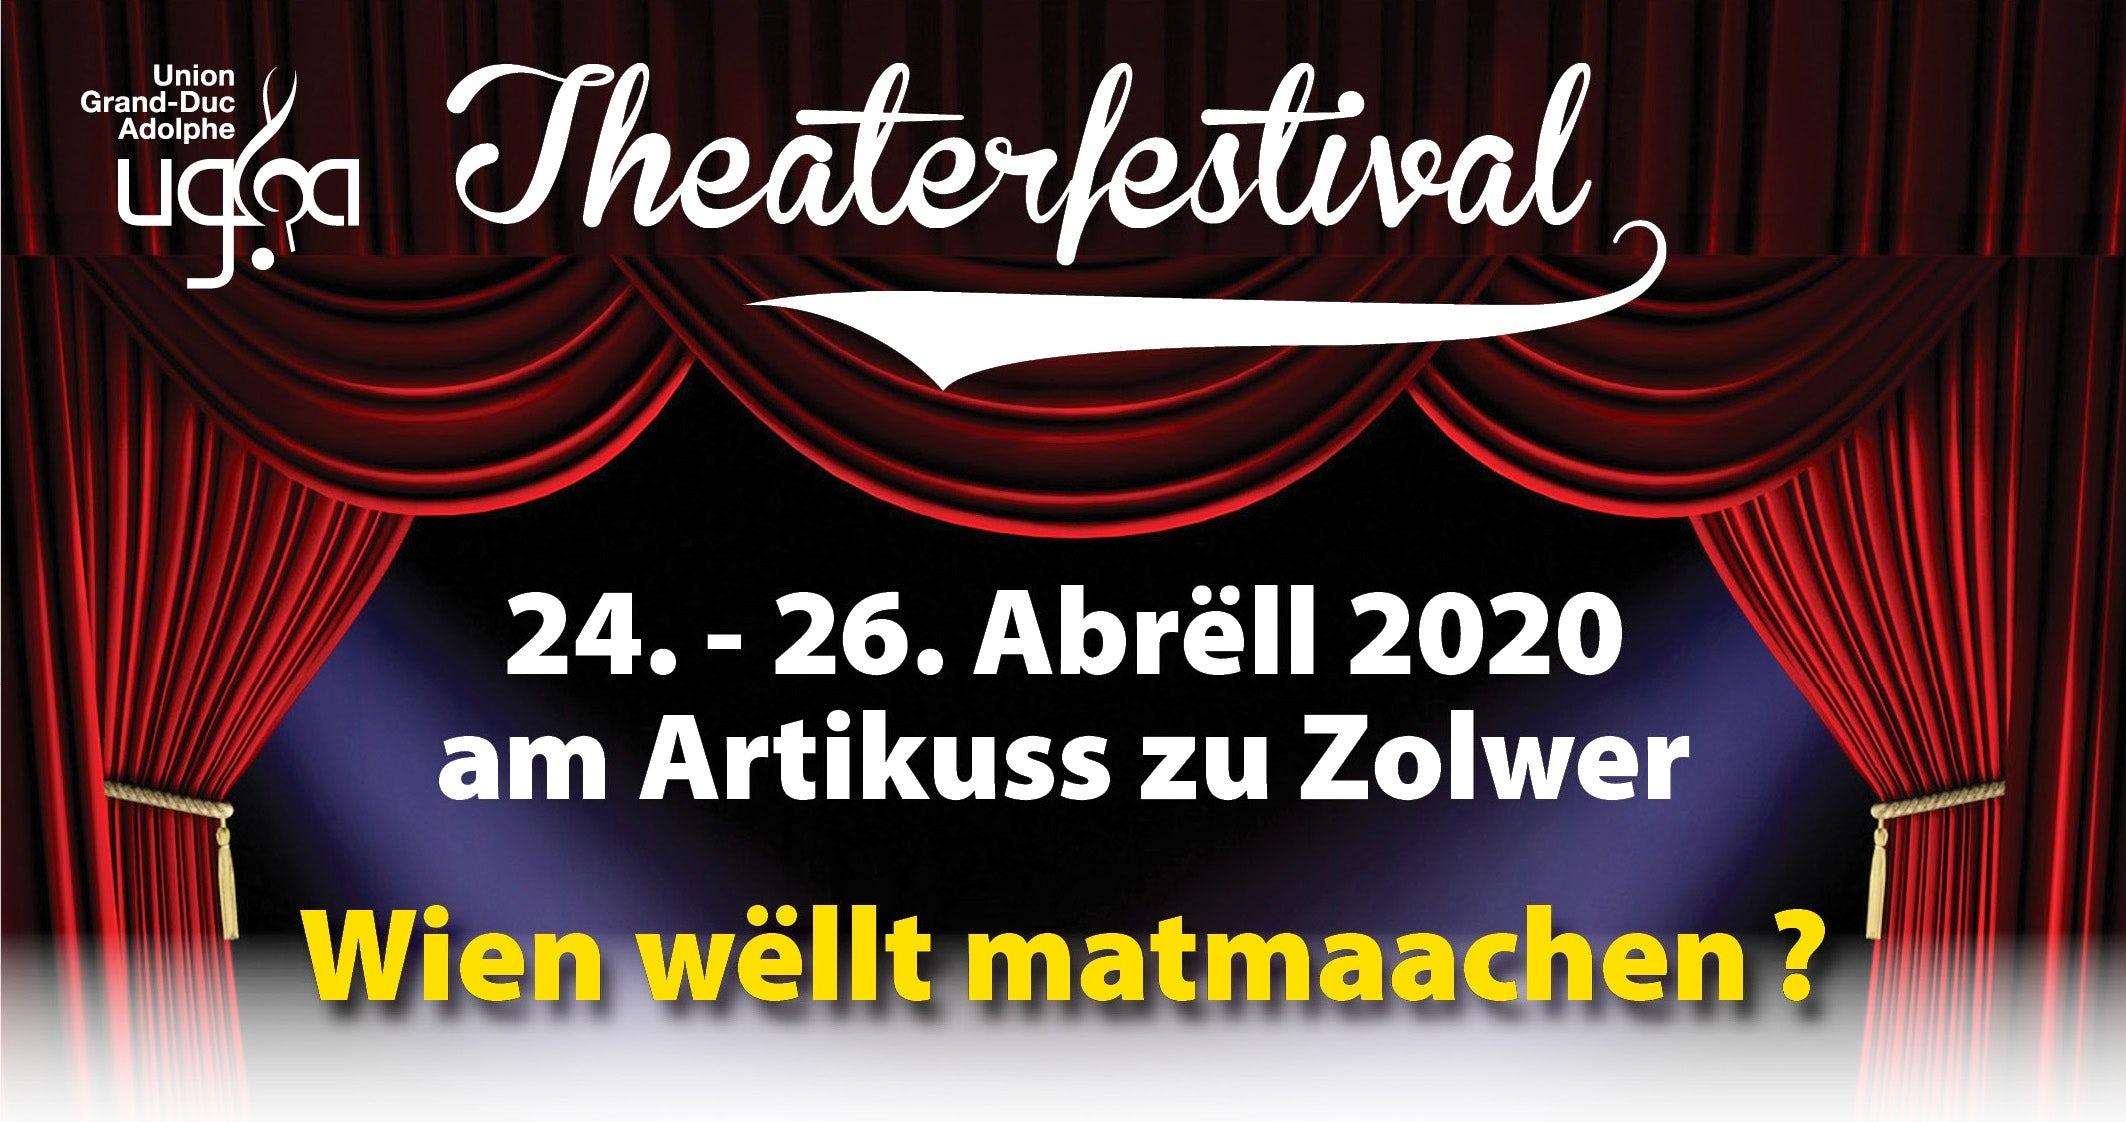 2018 Cp Theaterfestival